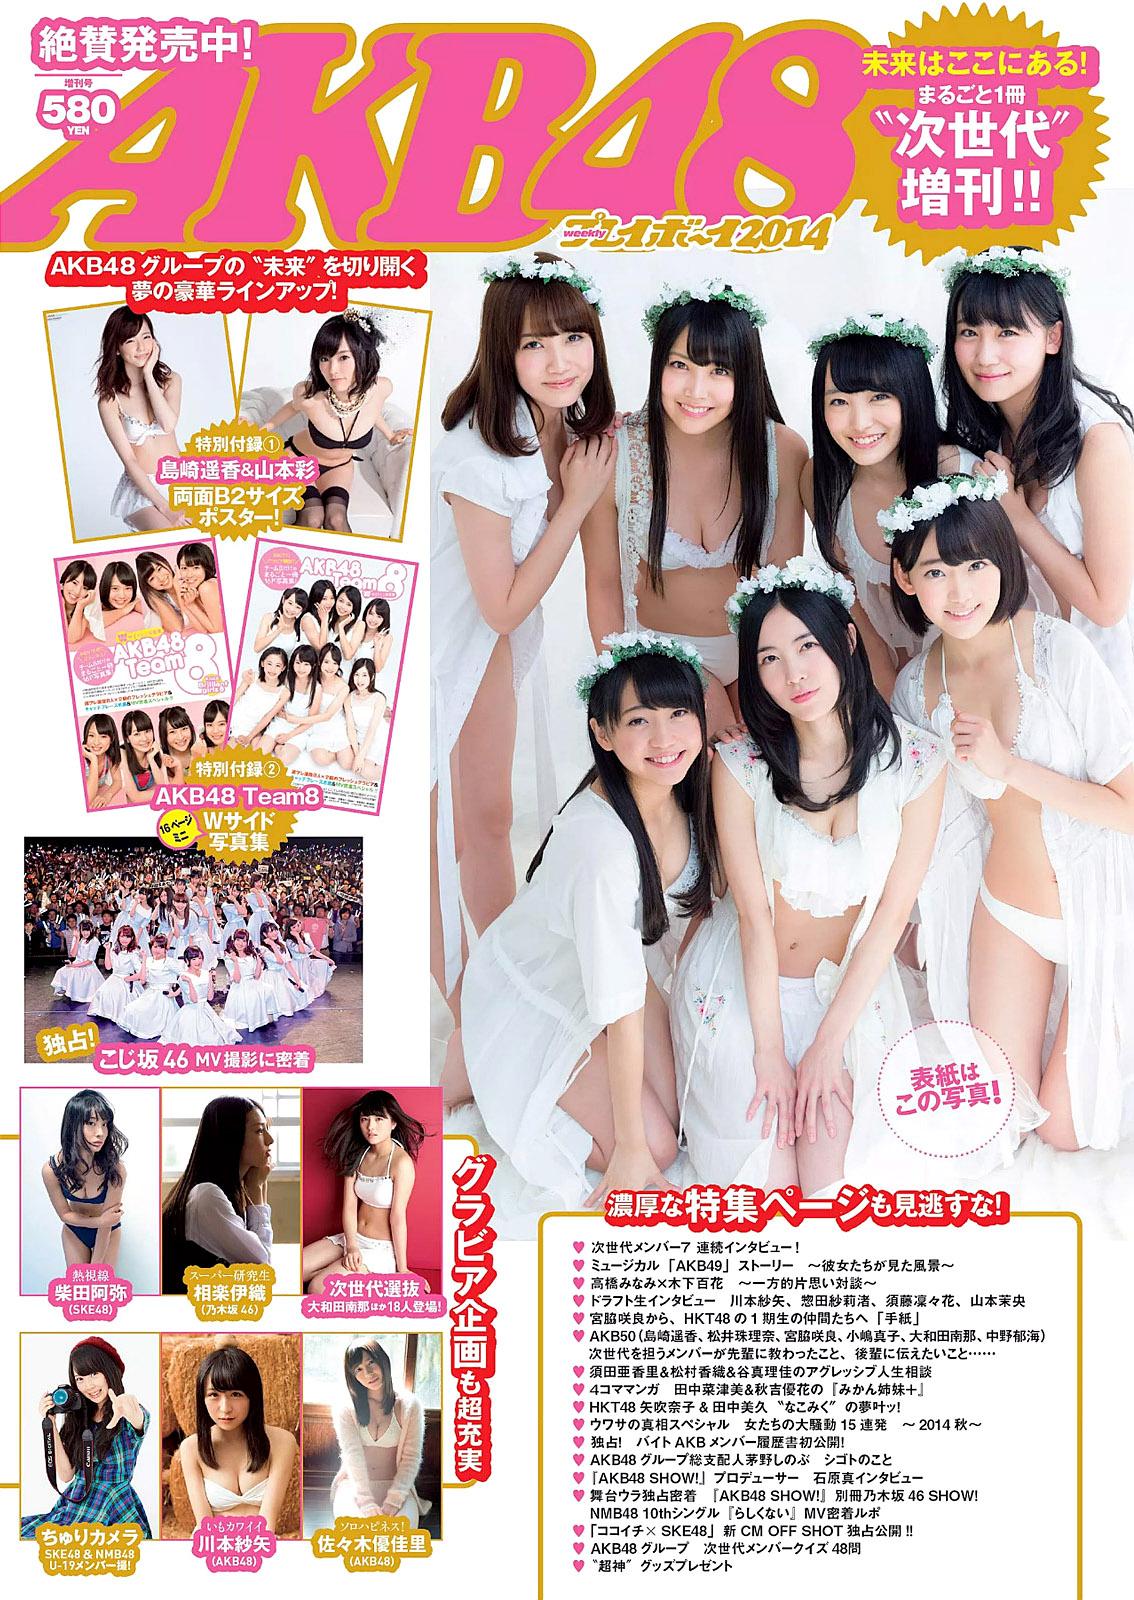 AKB48 WPB 141124 07.jpg